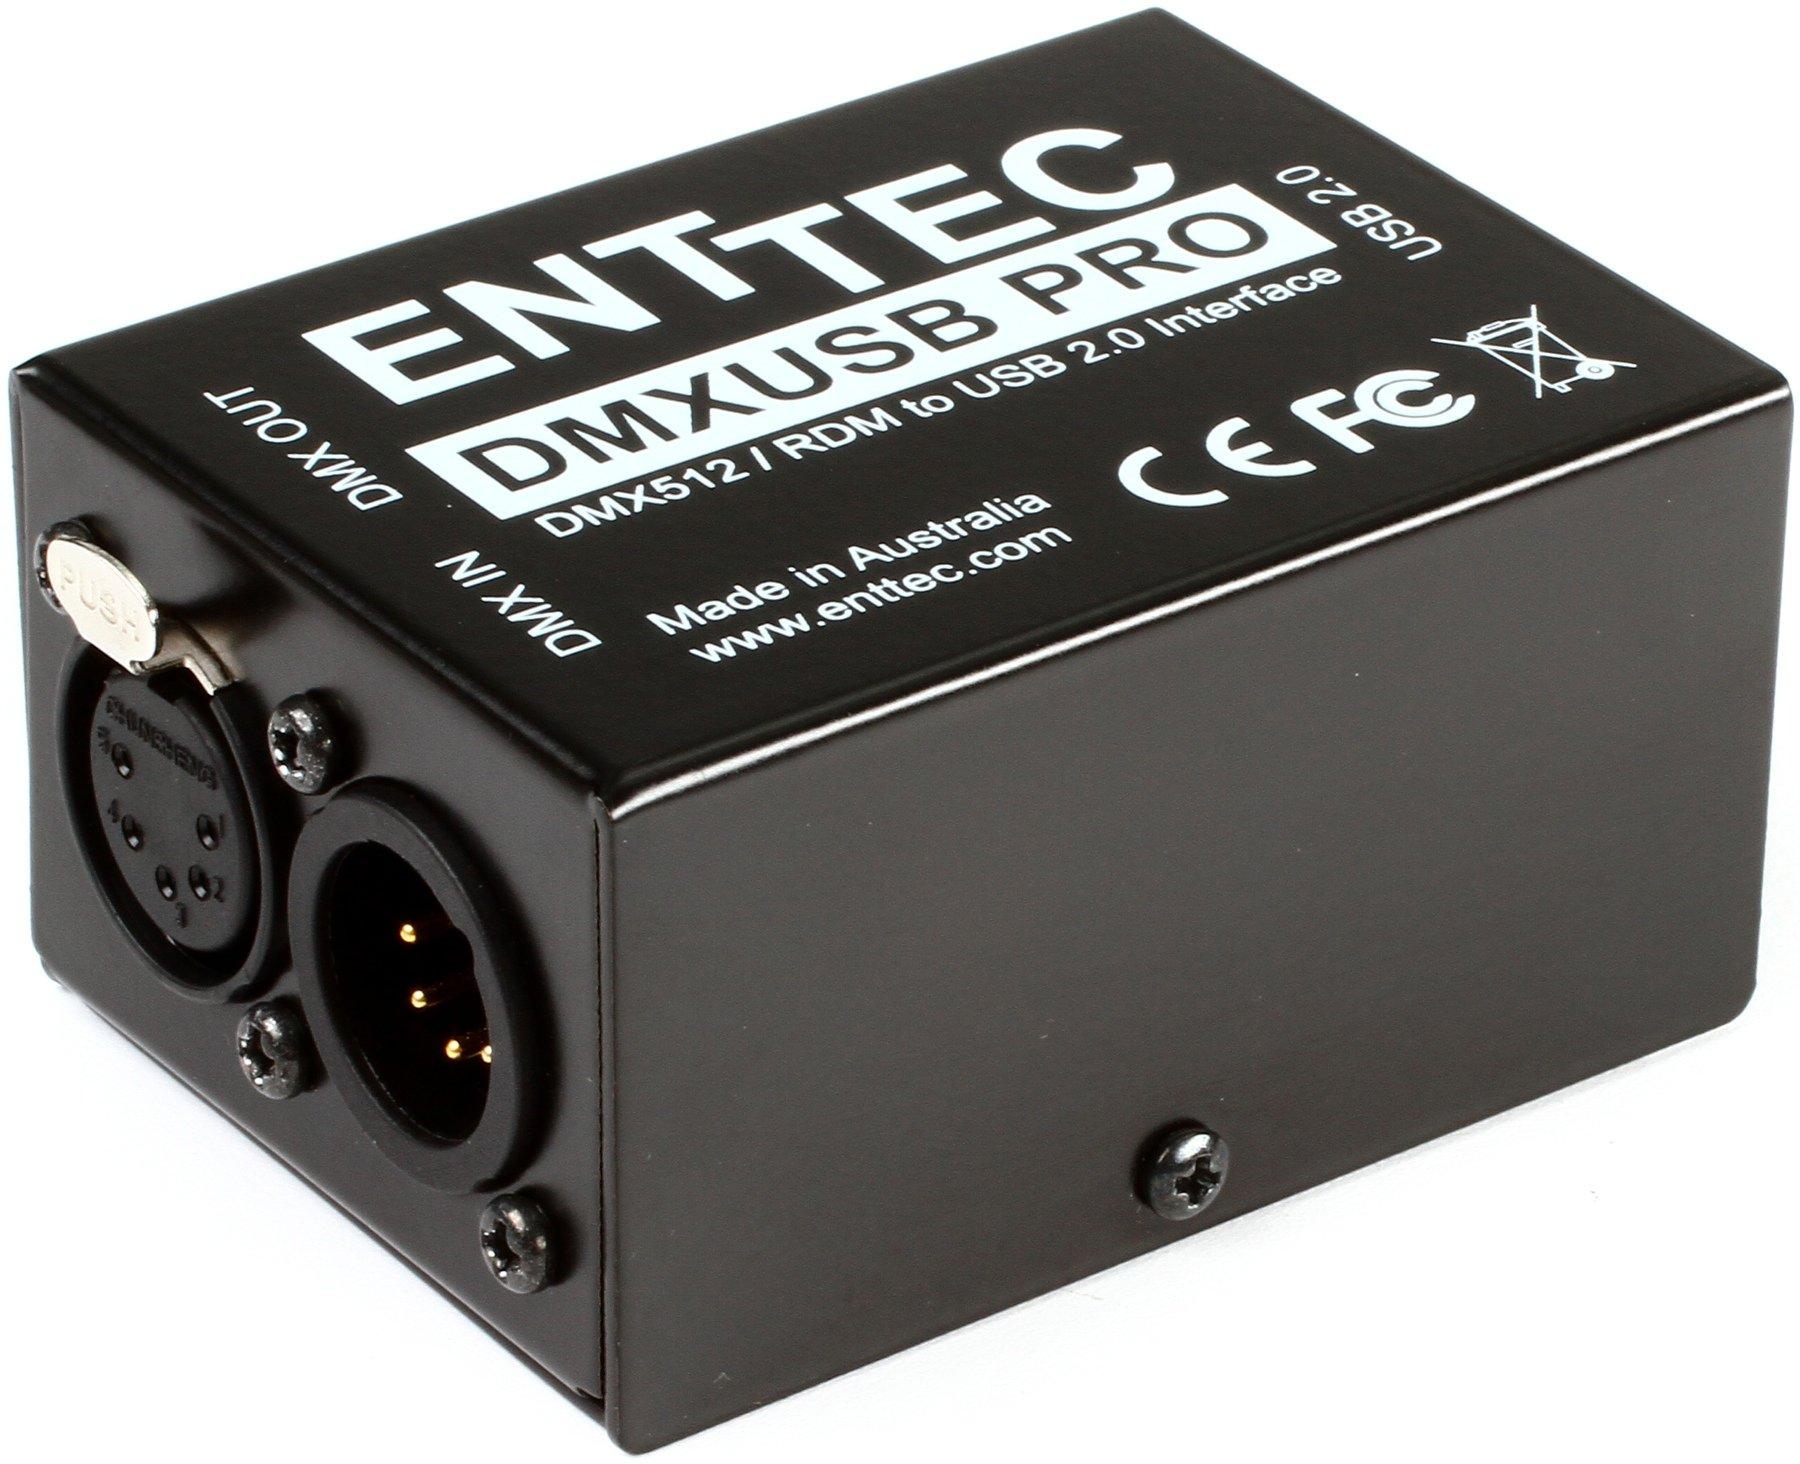 Enttec DMX USB Pro 70304 RDM Lighting Controller Interface